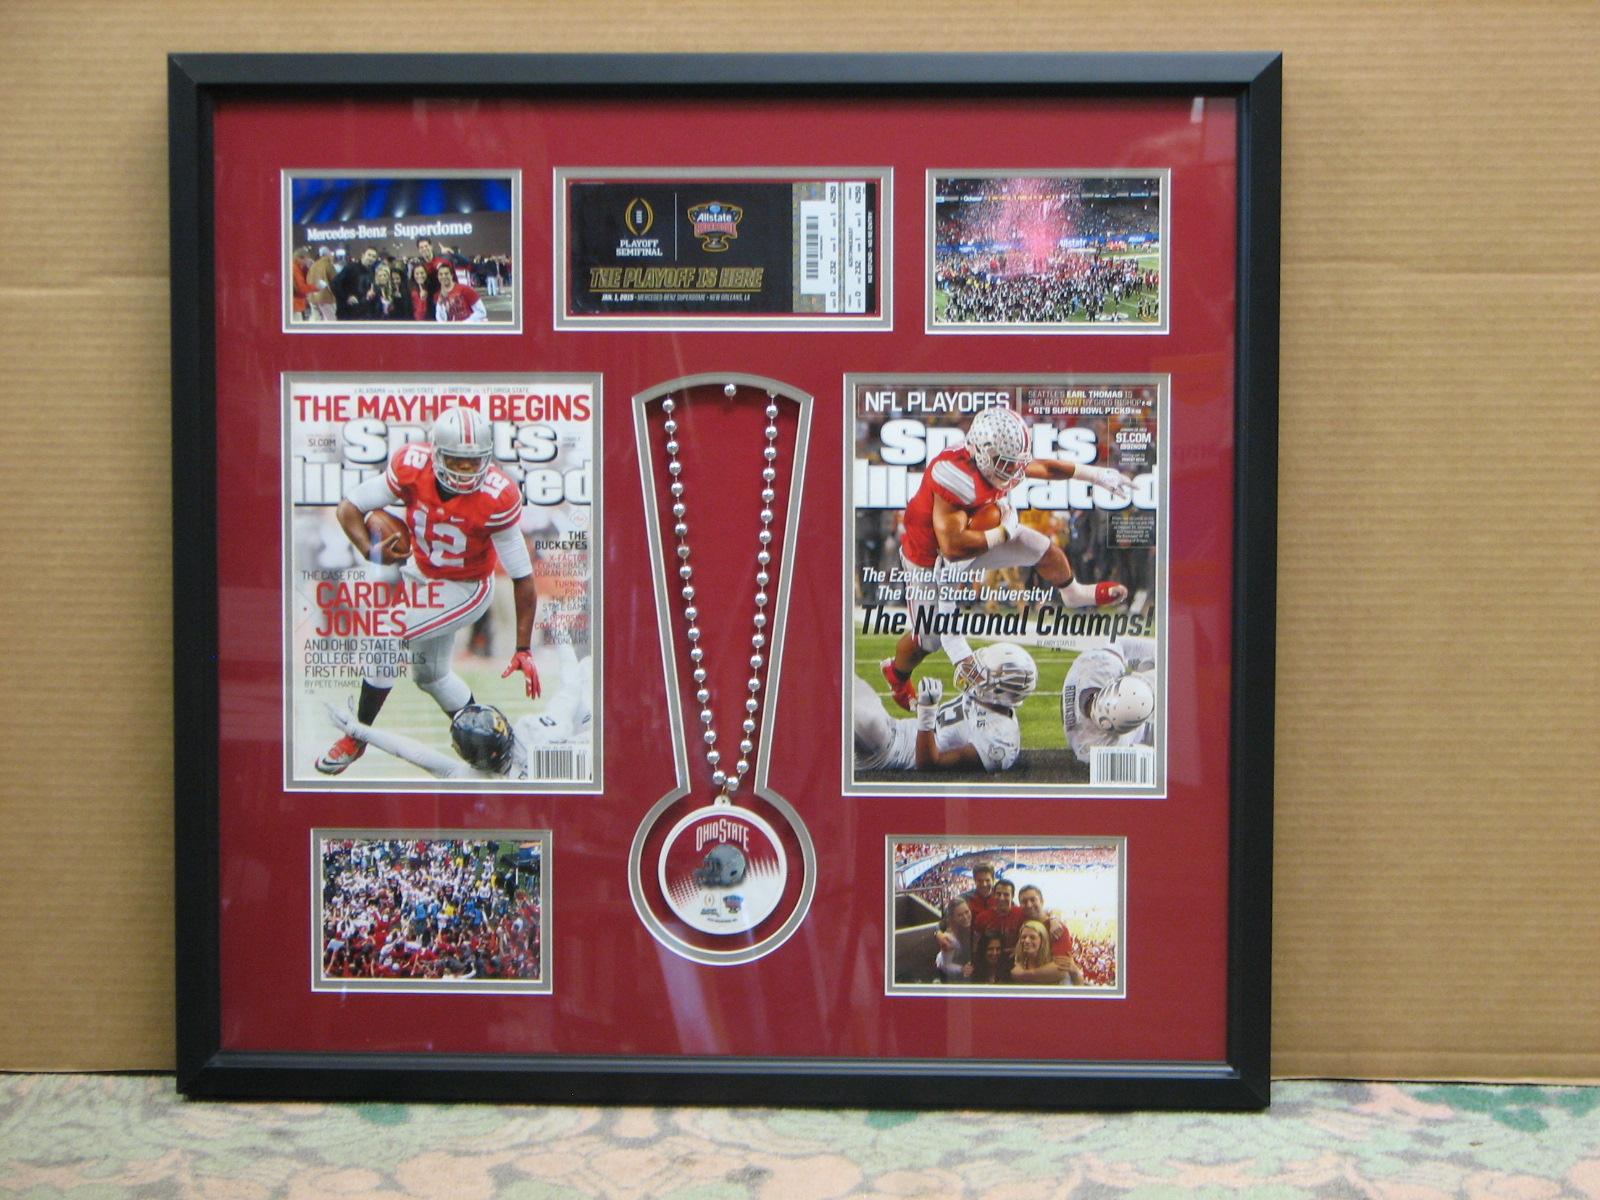 Ohio State Champions magazine and other memorabilia